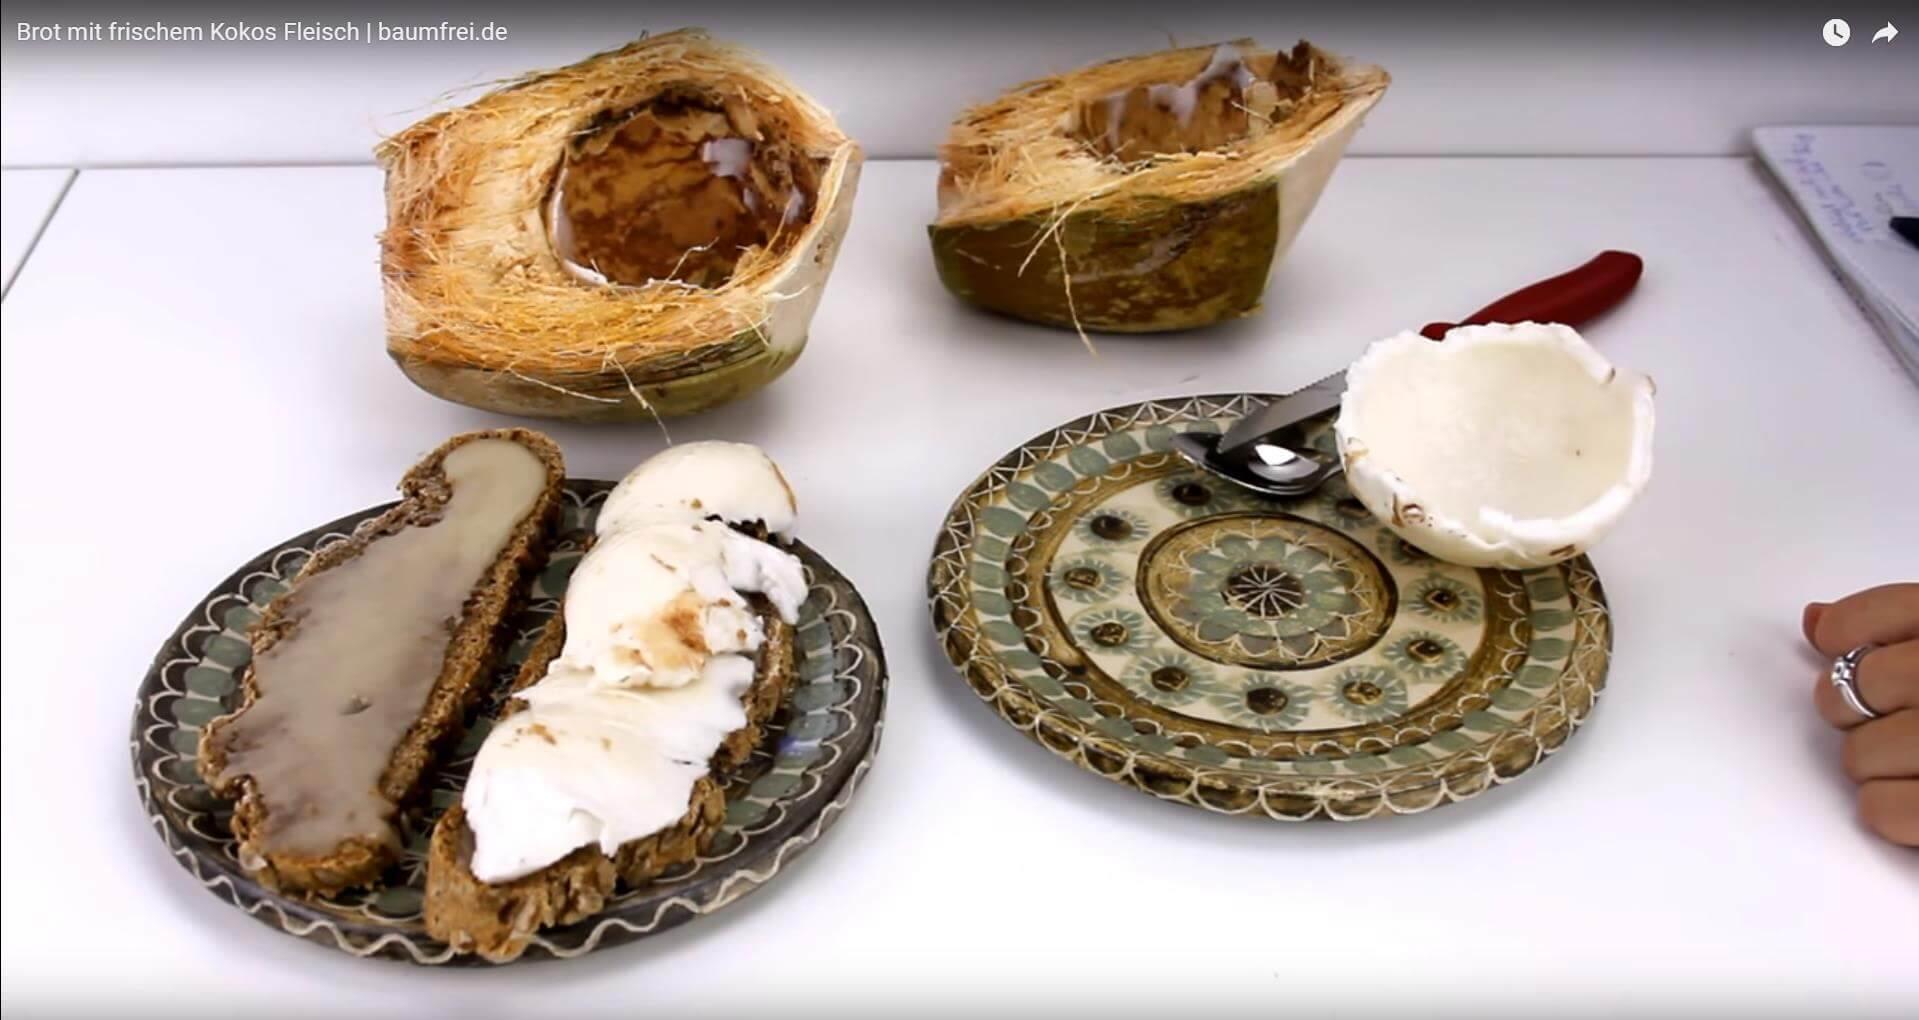 Grüne Kokosnüsse - Pia Brouwers - baumfrei.de - AB1